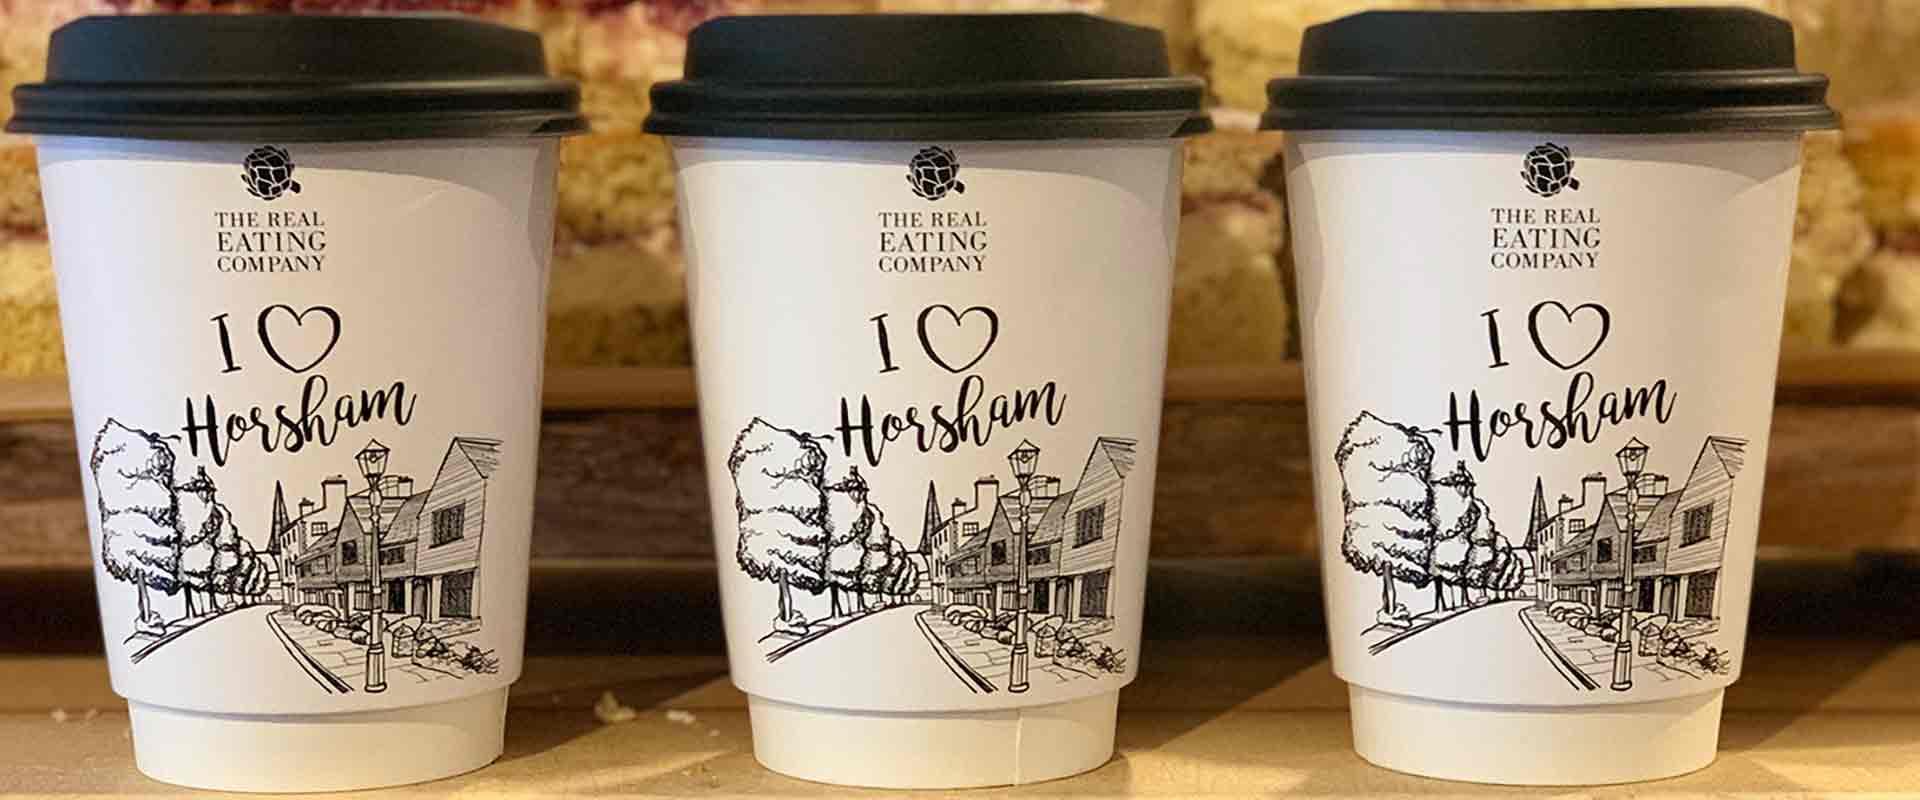 Horsham Cafe Eating Out Horsham The Real Eating Company